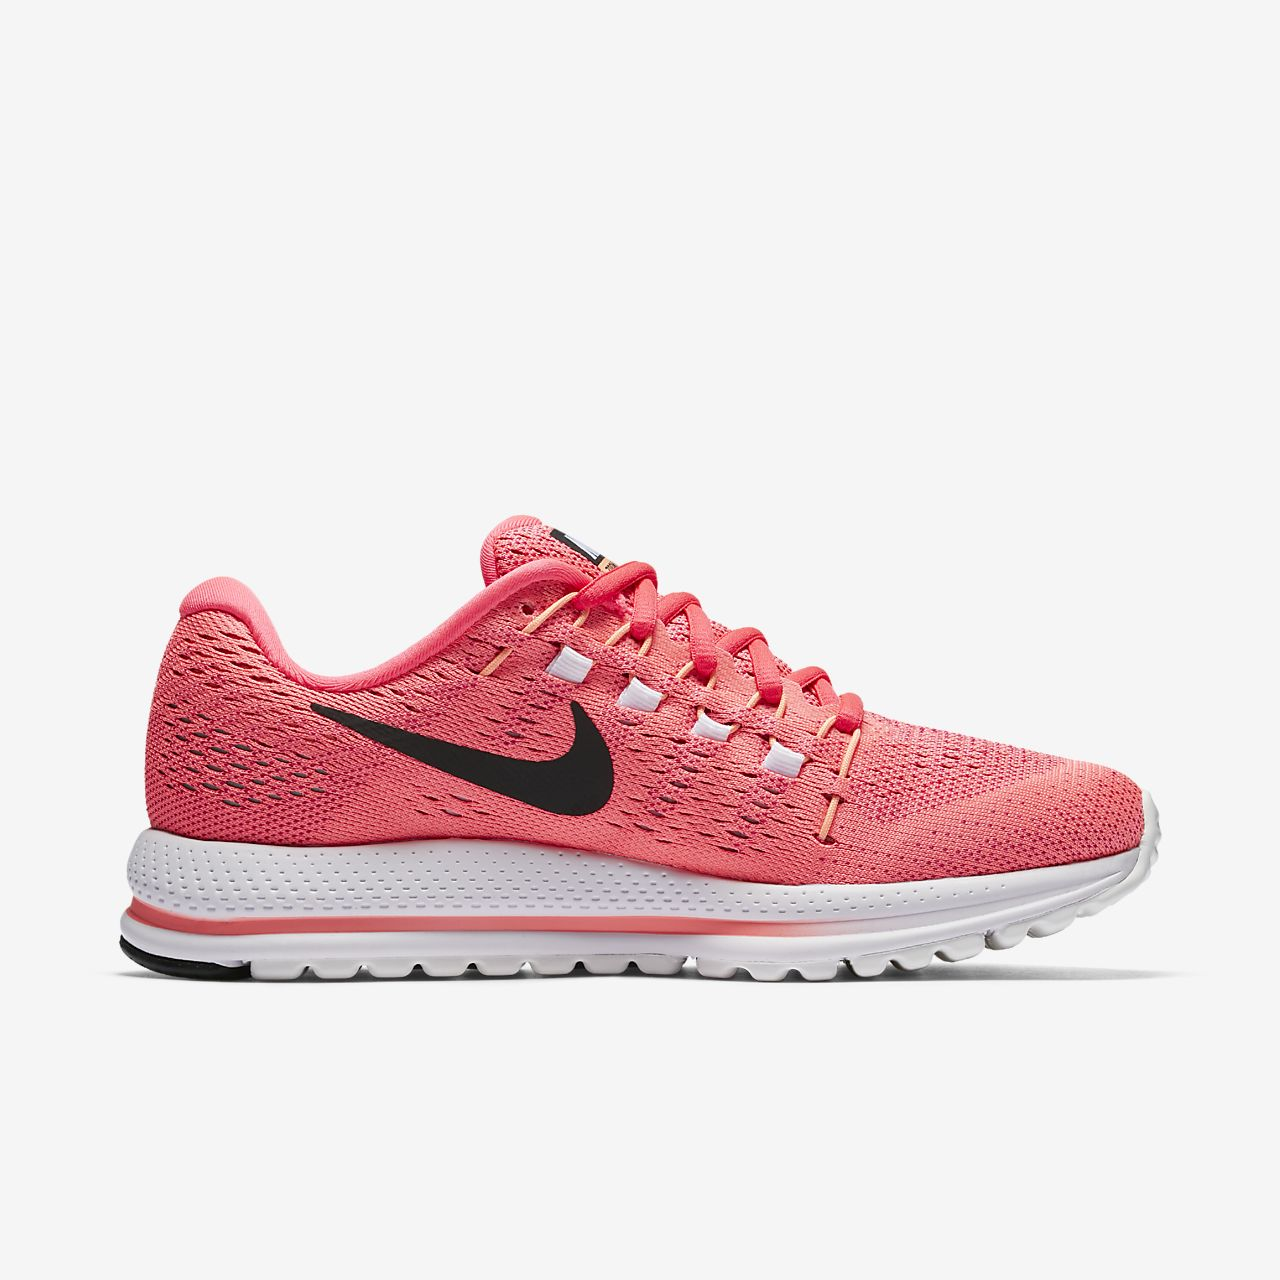 Nike Air Zoom Vomero 12 W - Laufschuhe Damen